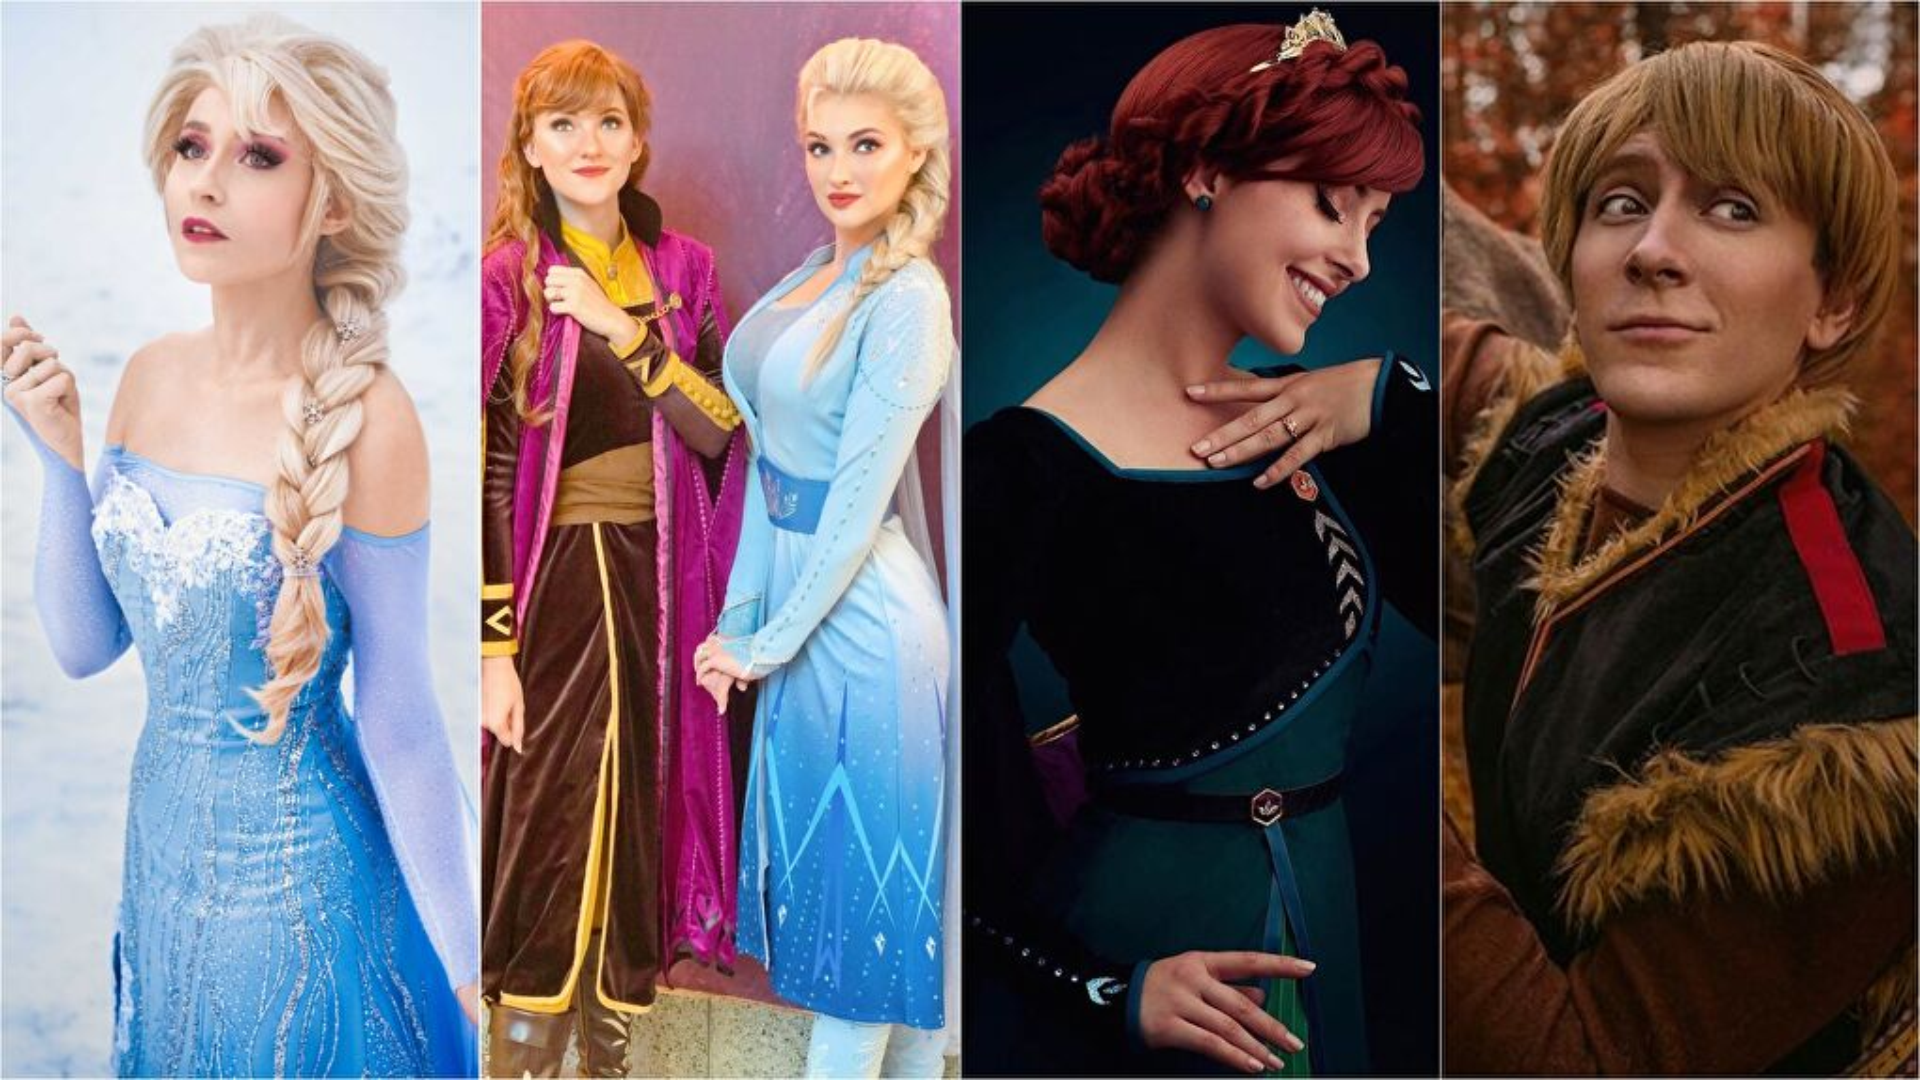 Frozen Cosplays - Elsa Cosplay, Anna Cosplay, Kristoff Cosplay